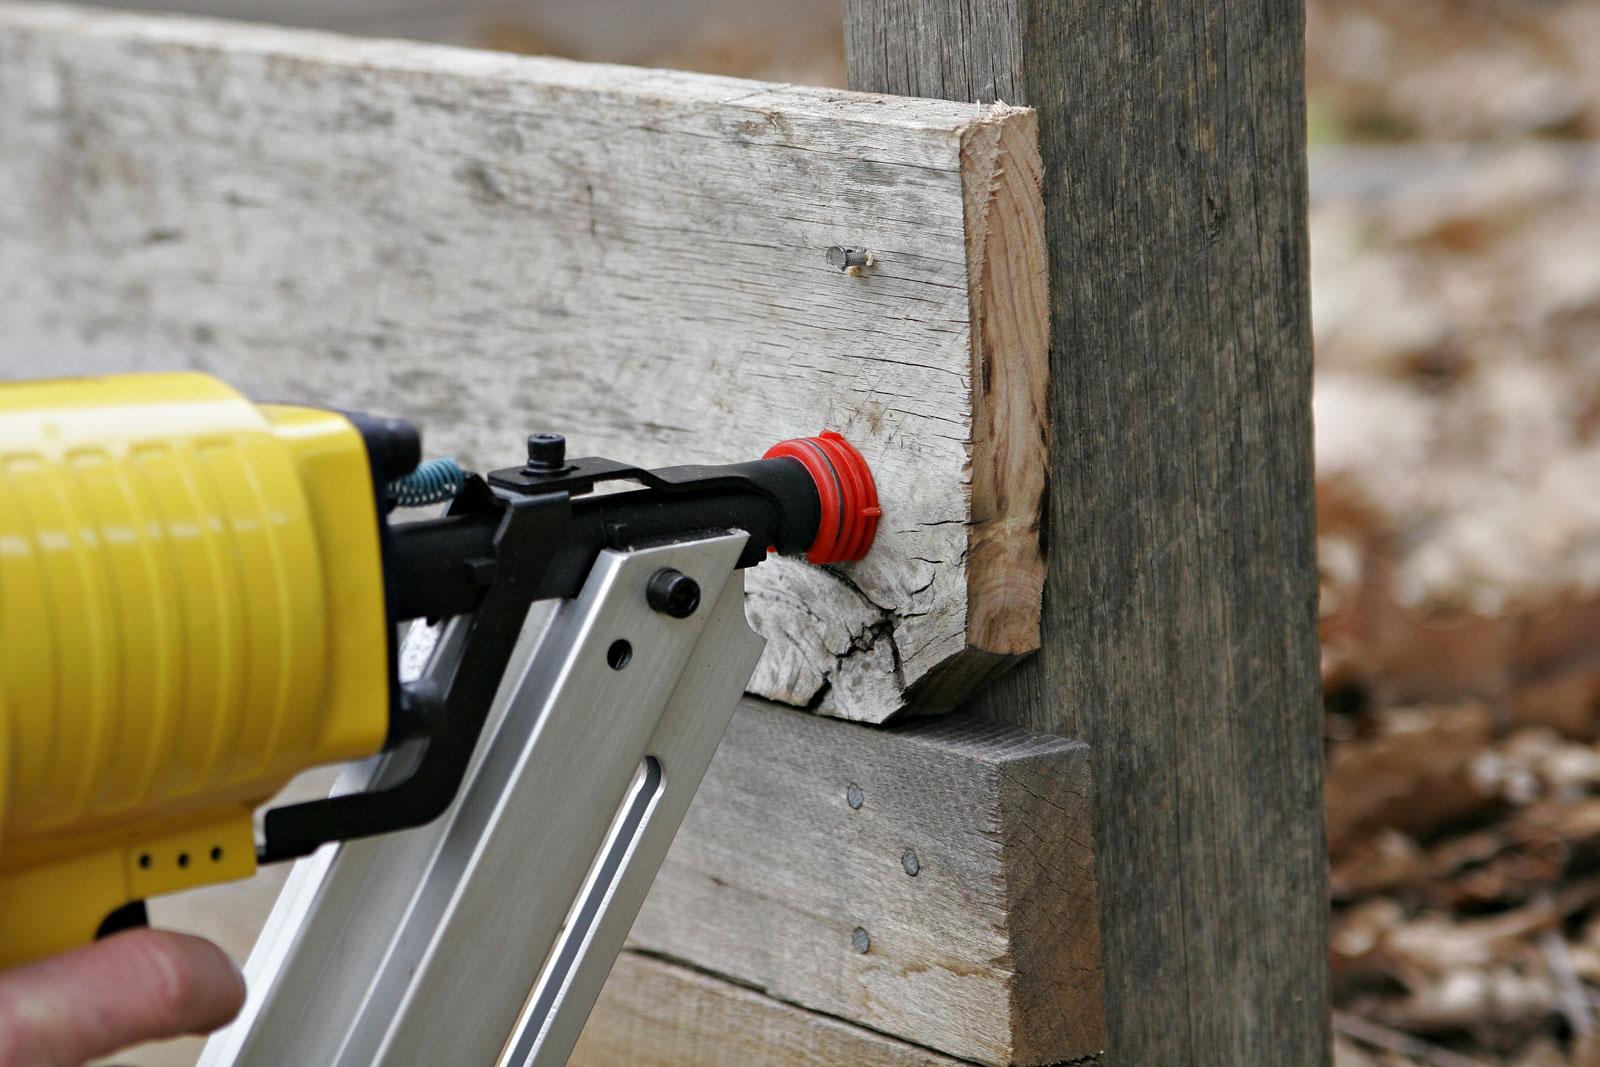 File:Nail gun.jpg - Wikimedia Commons